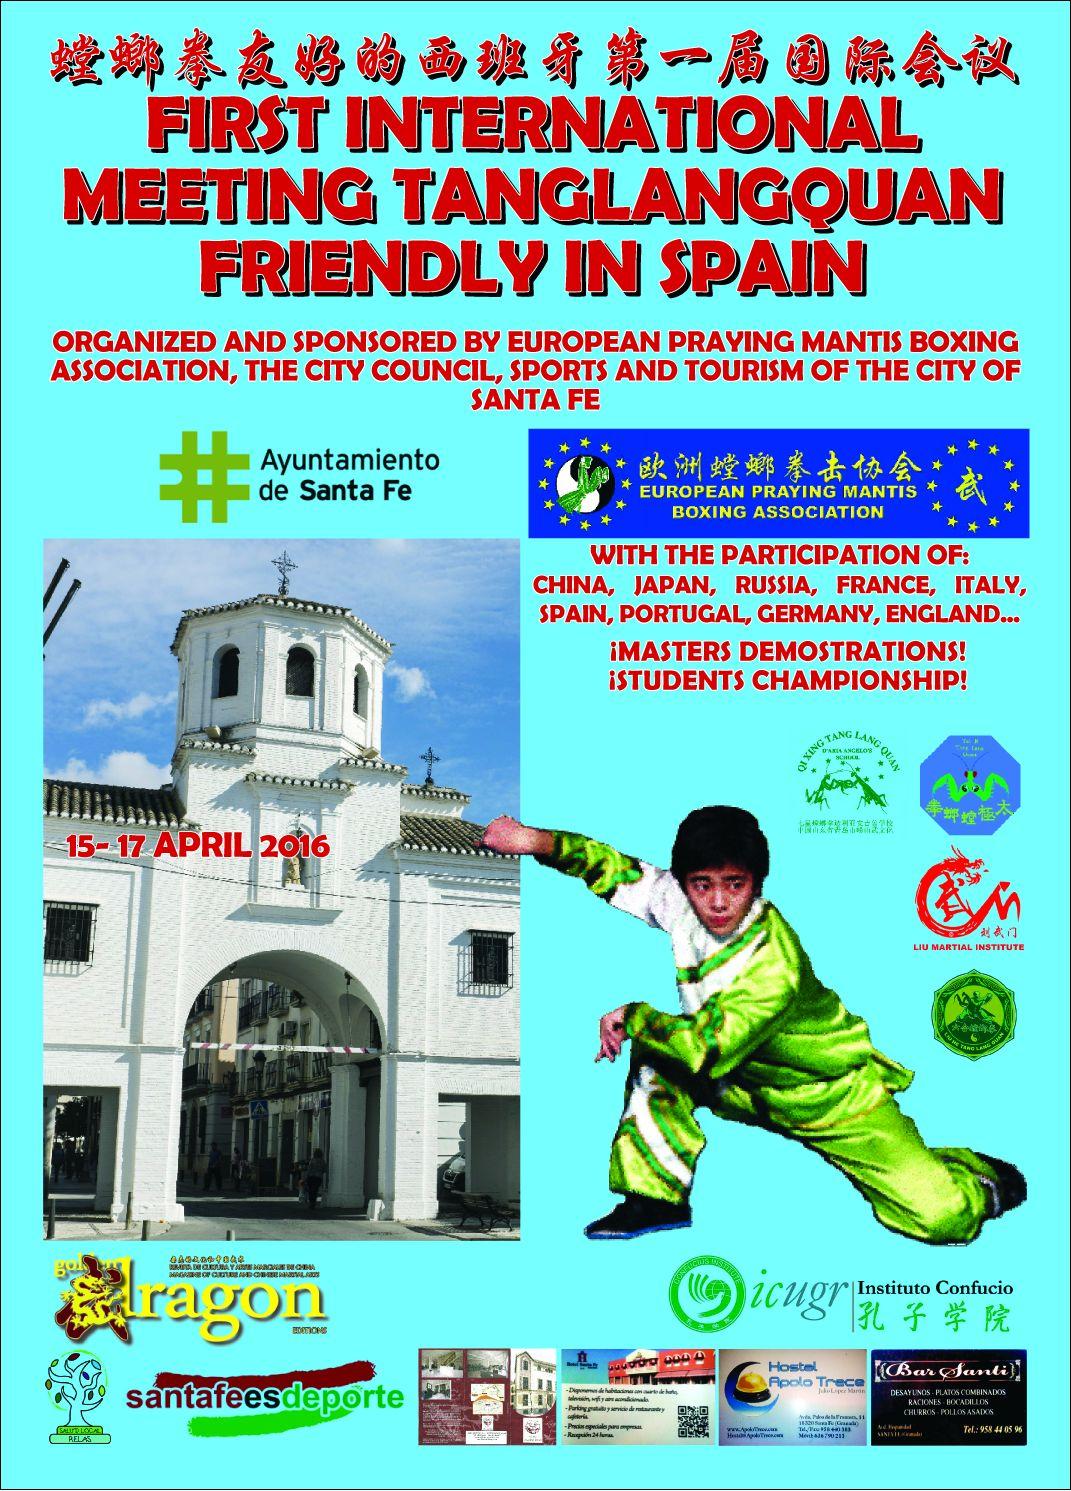 First_International_Meeting_TLQ_Spain_2016.jpg